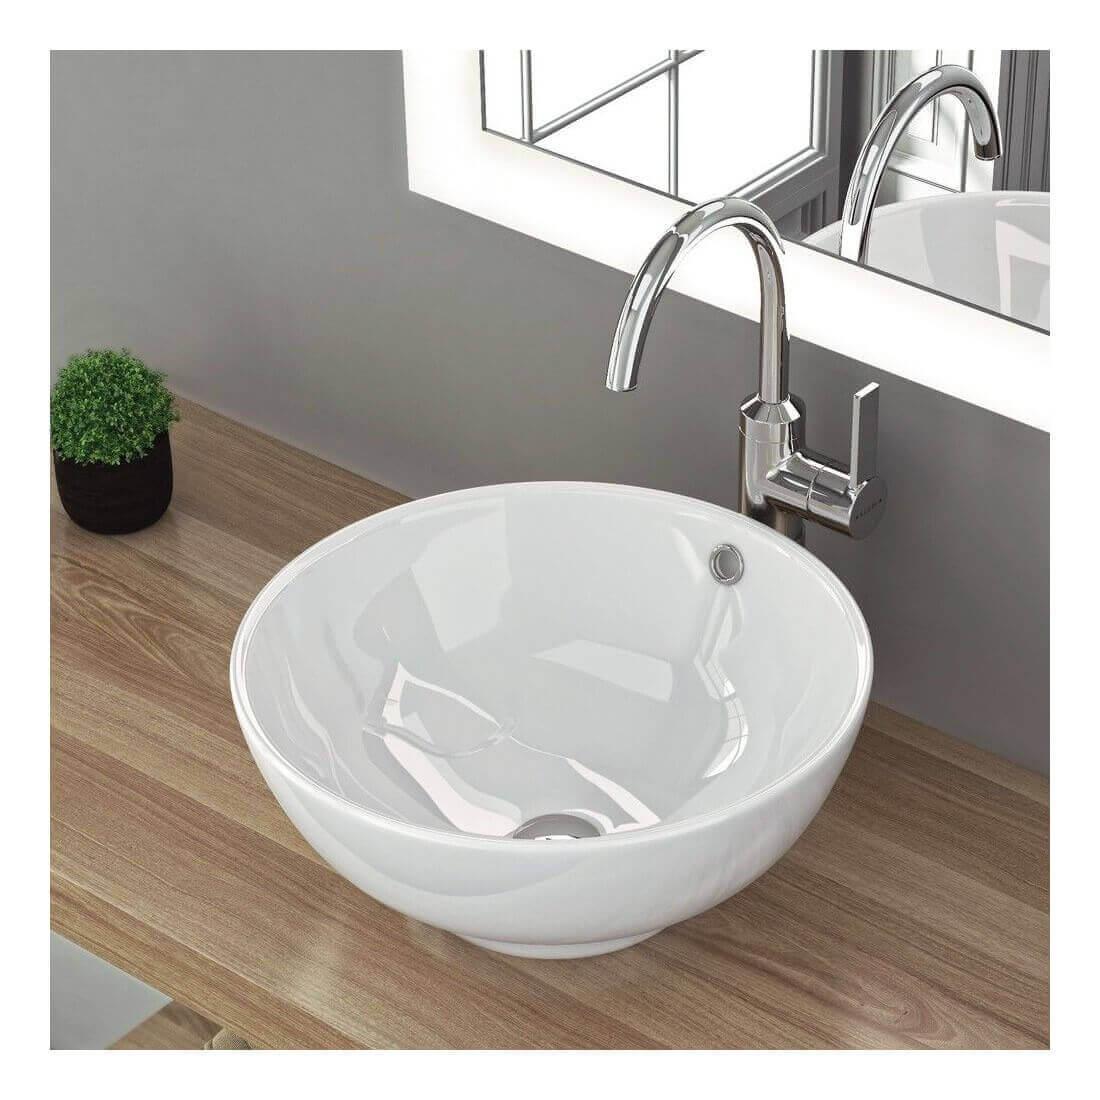 Lavabo sobre encimera aika the bath for Lavabo sobre